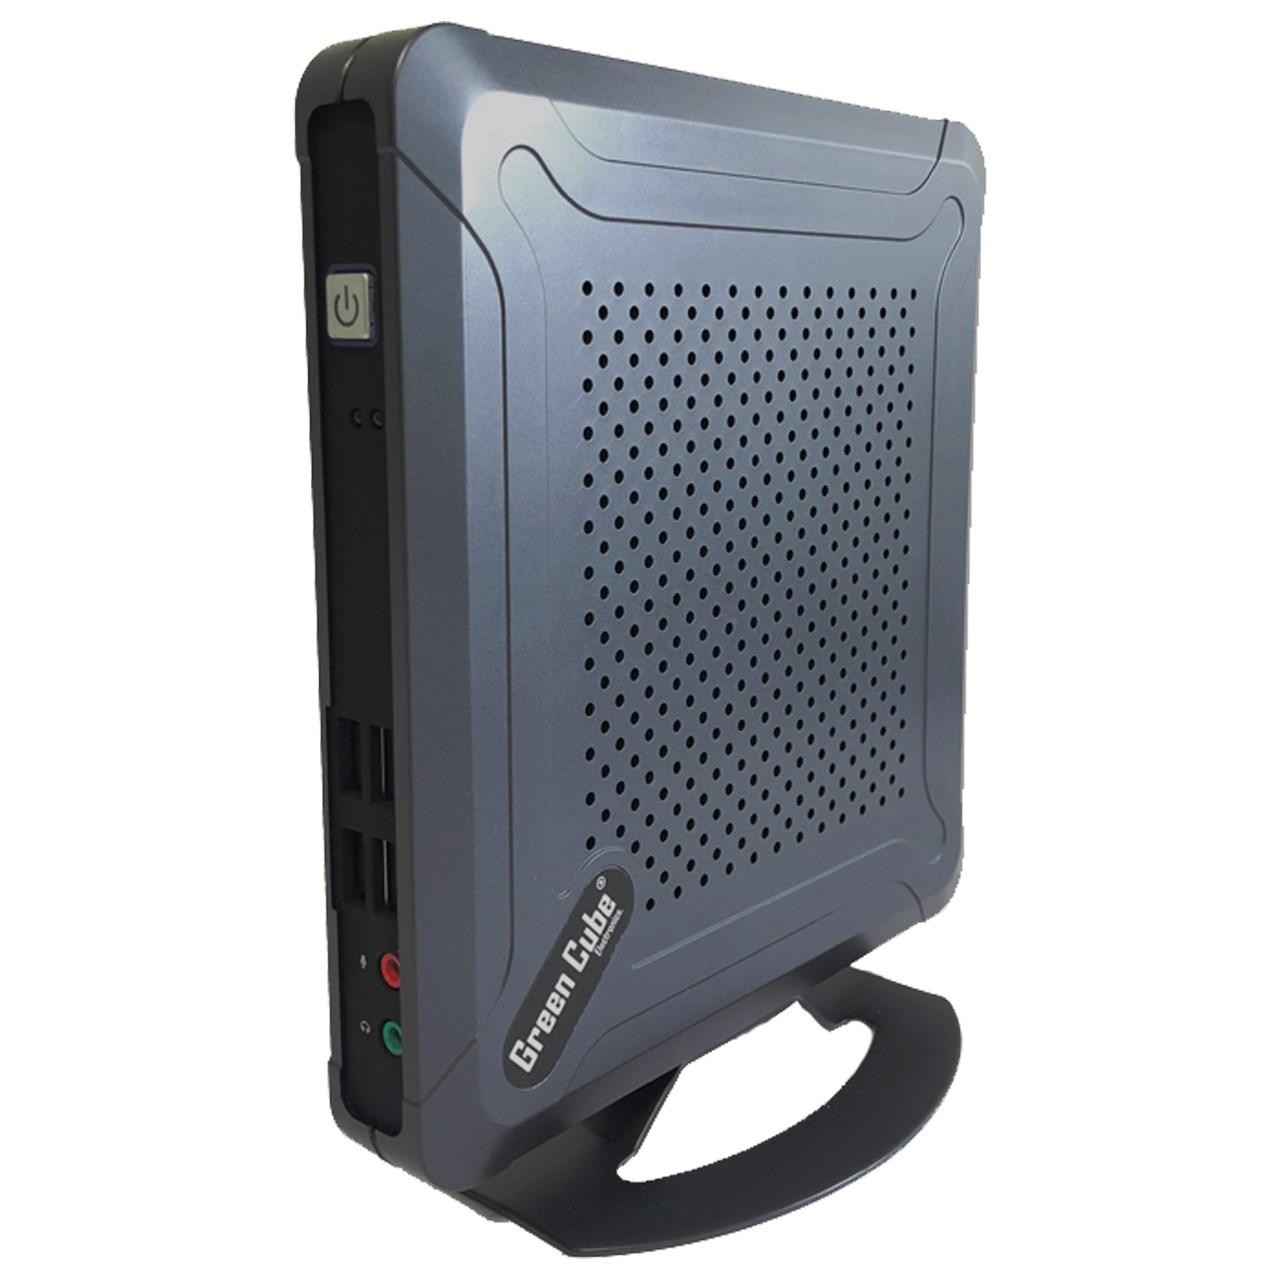 کامپیوتر کوچک گرین کیوب مدل GRC1037UP